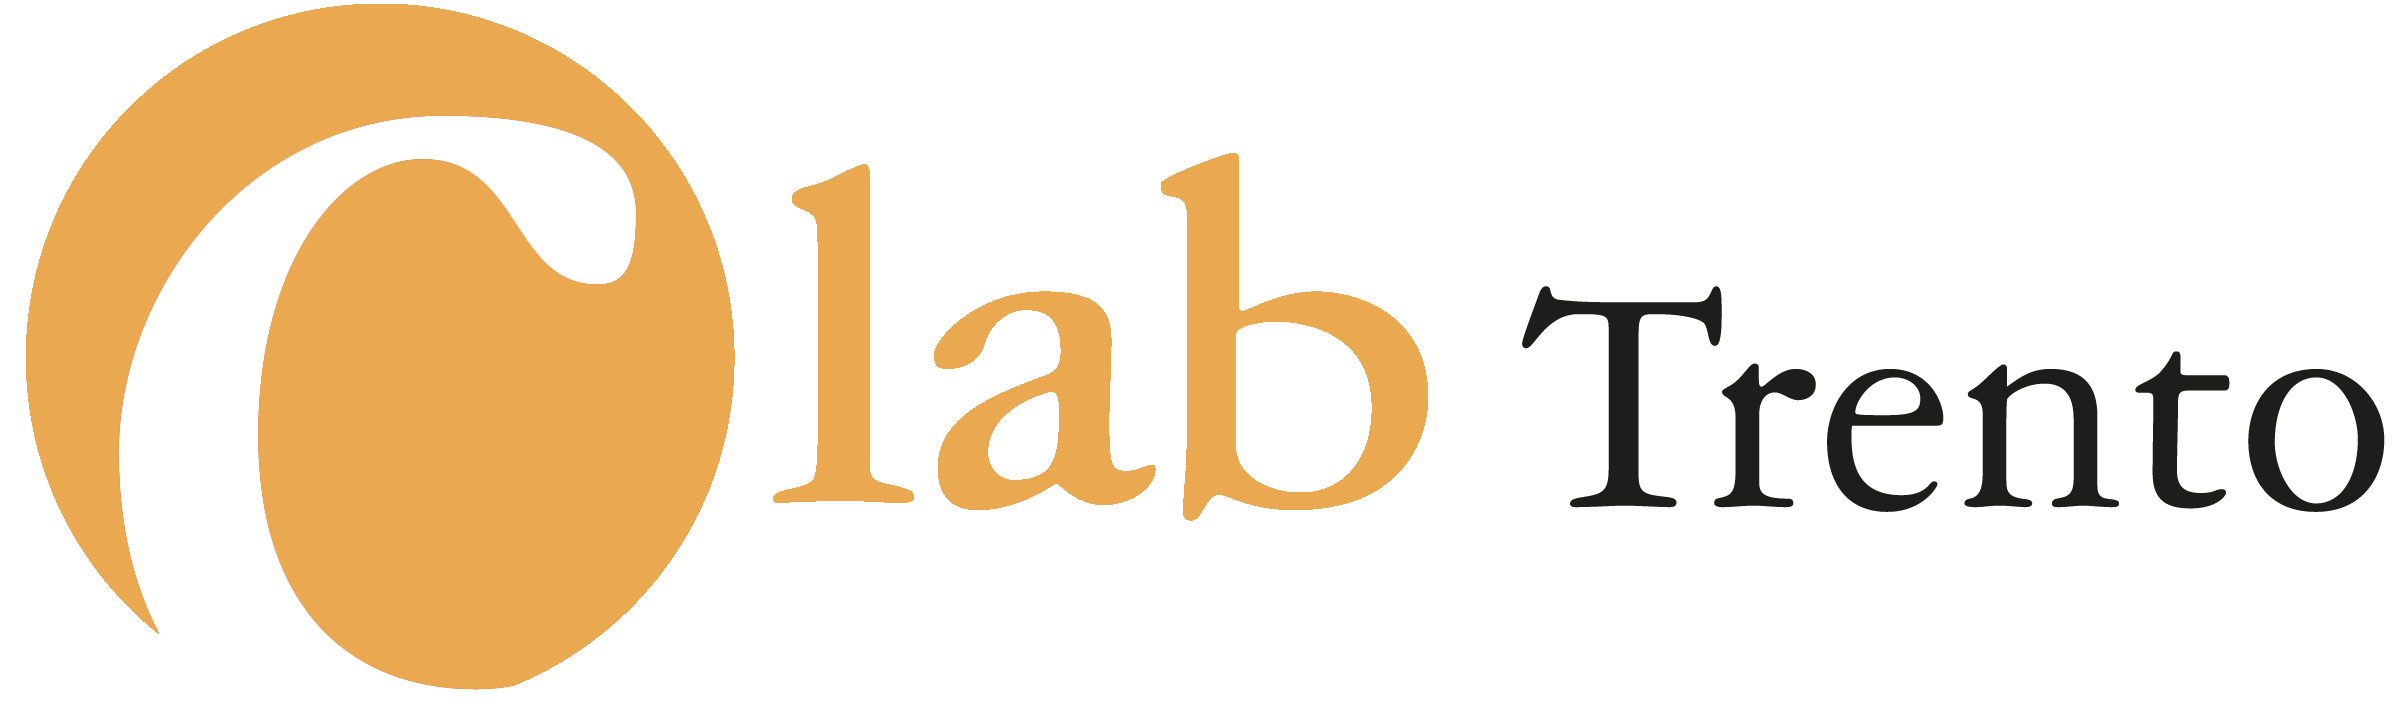 Clab Trento